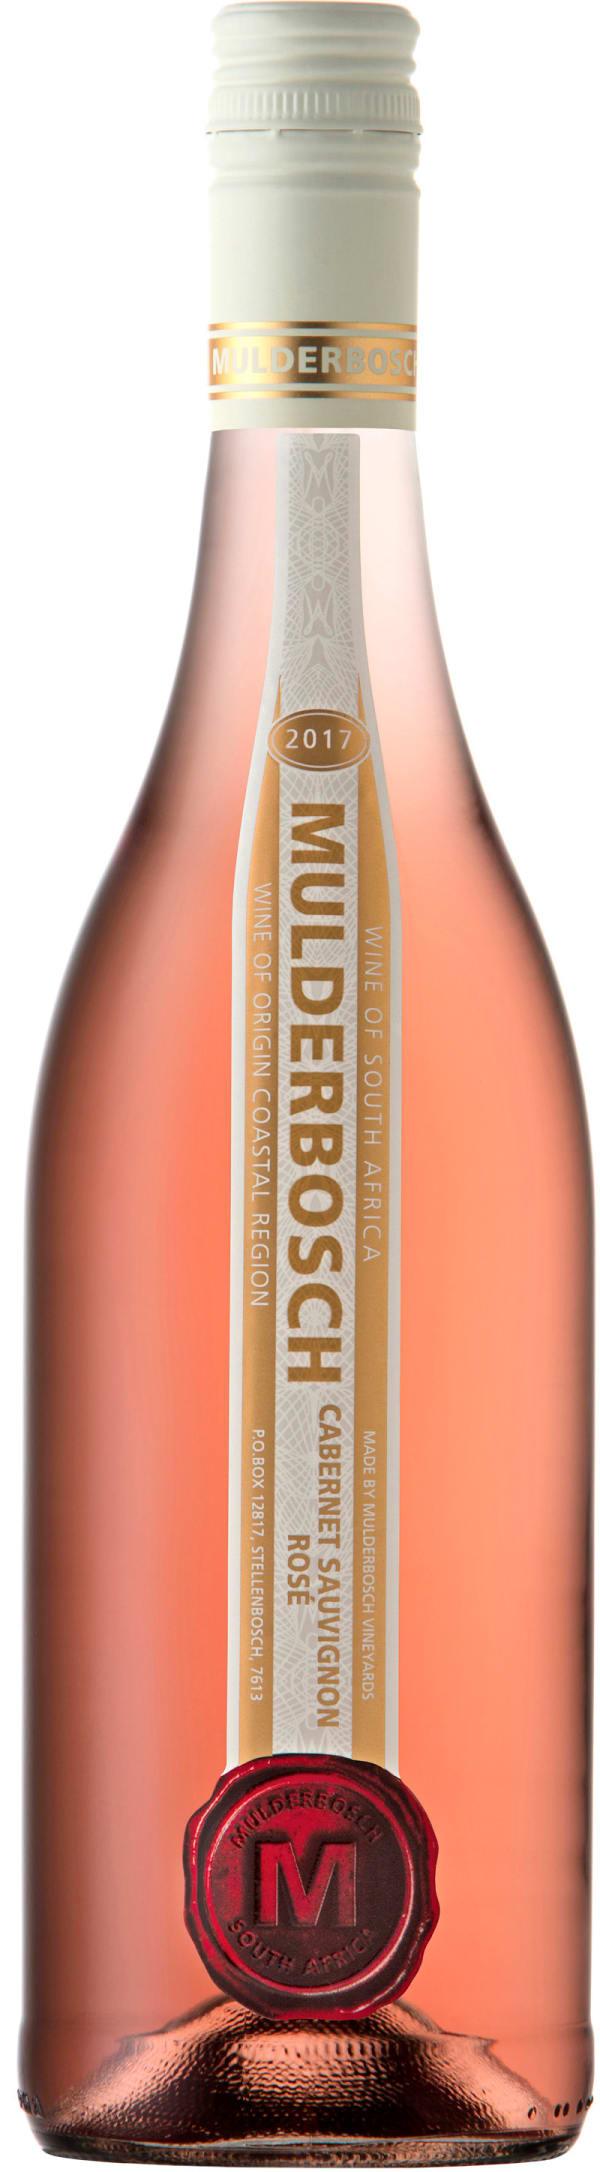 Mulderbosch Cabernet Sauvignon Rosé 2017